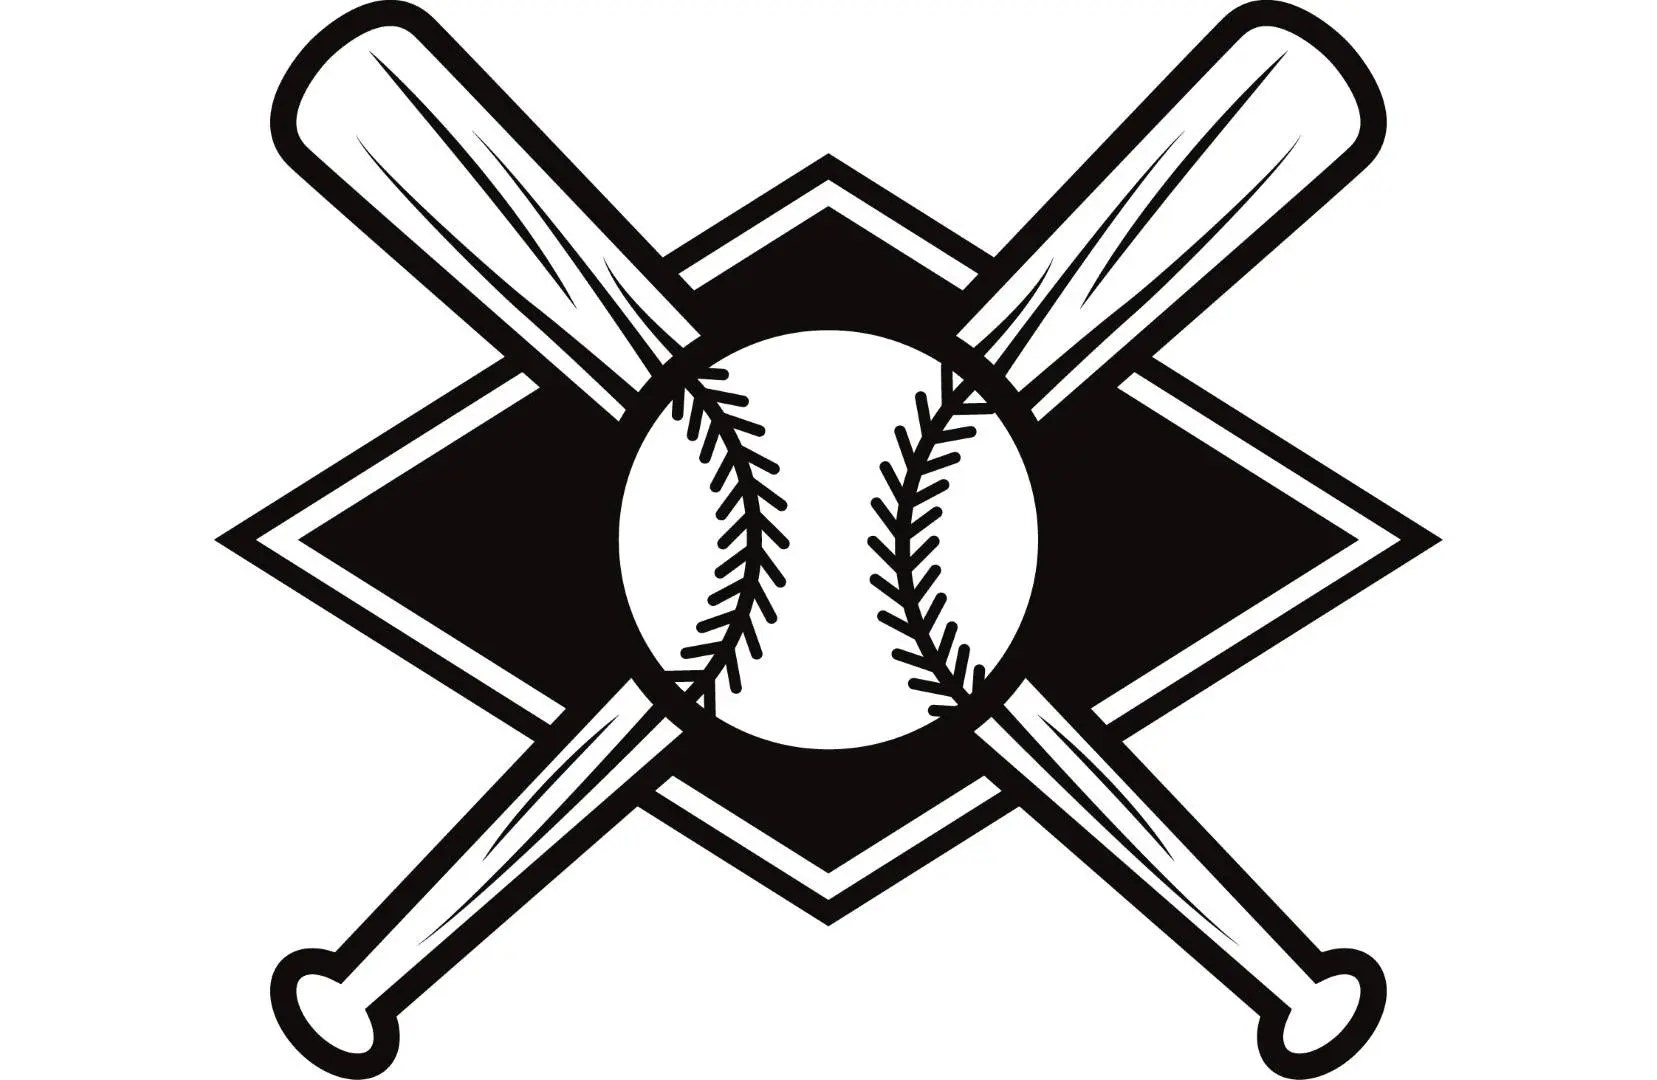 Baseball Logo 4 Bats Crossed Ball Diamond League Equipment